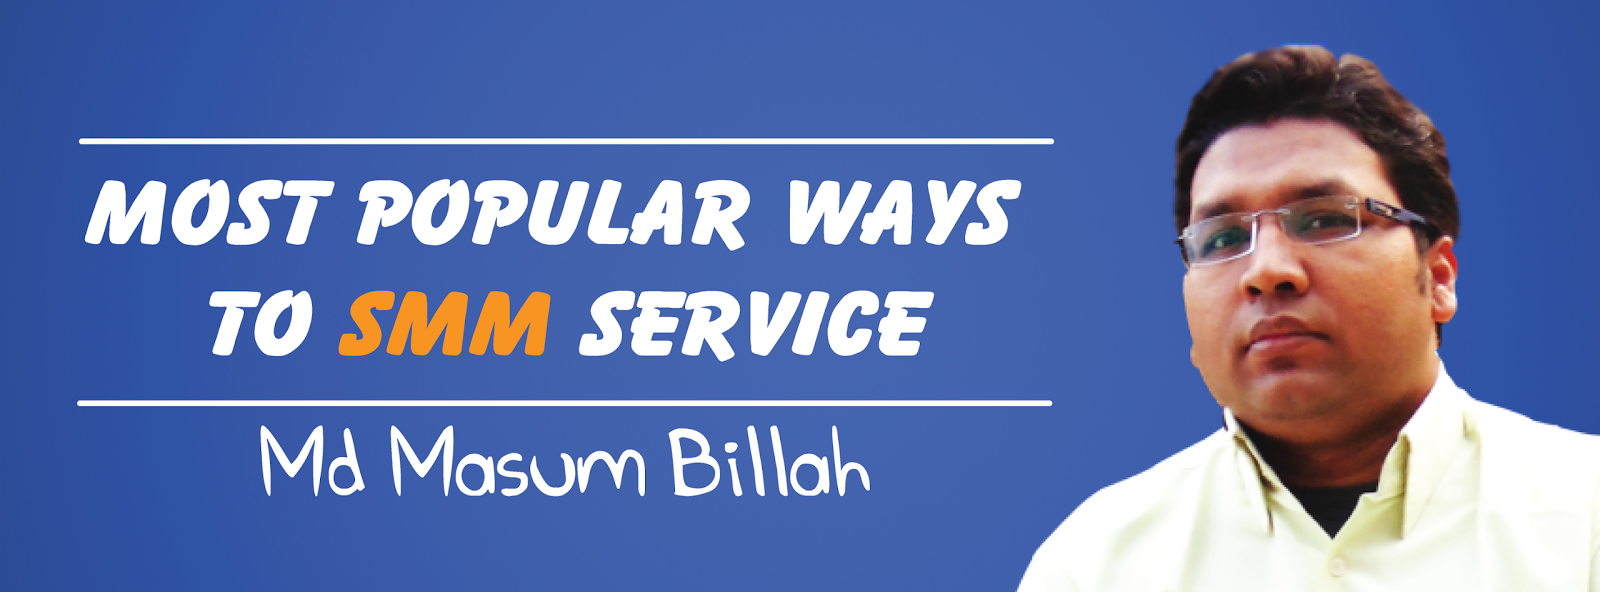 Masum Billah SMM Service